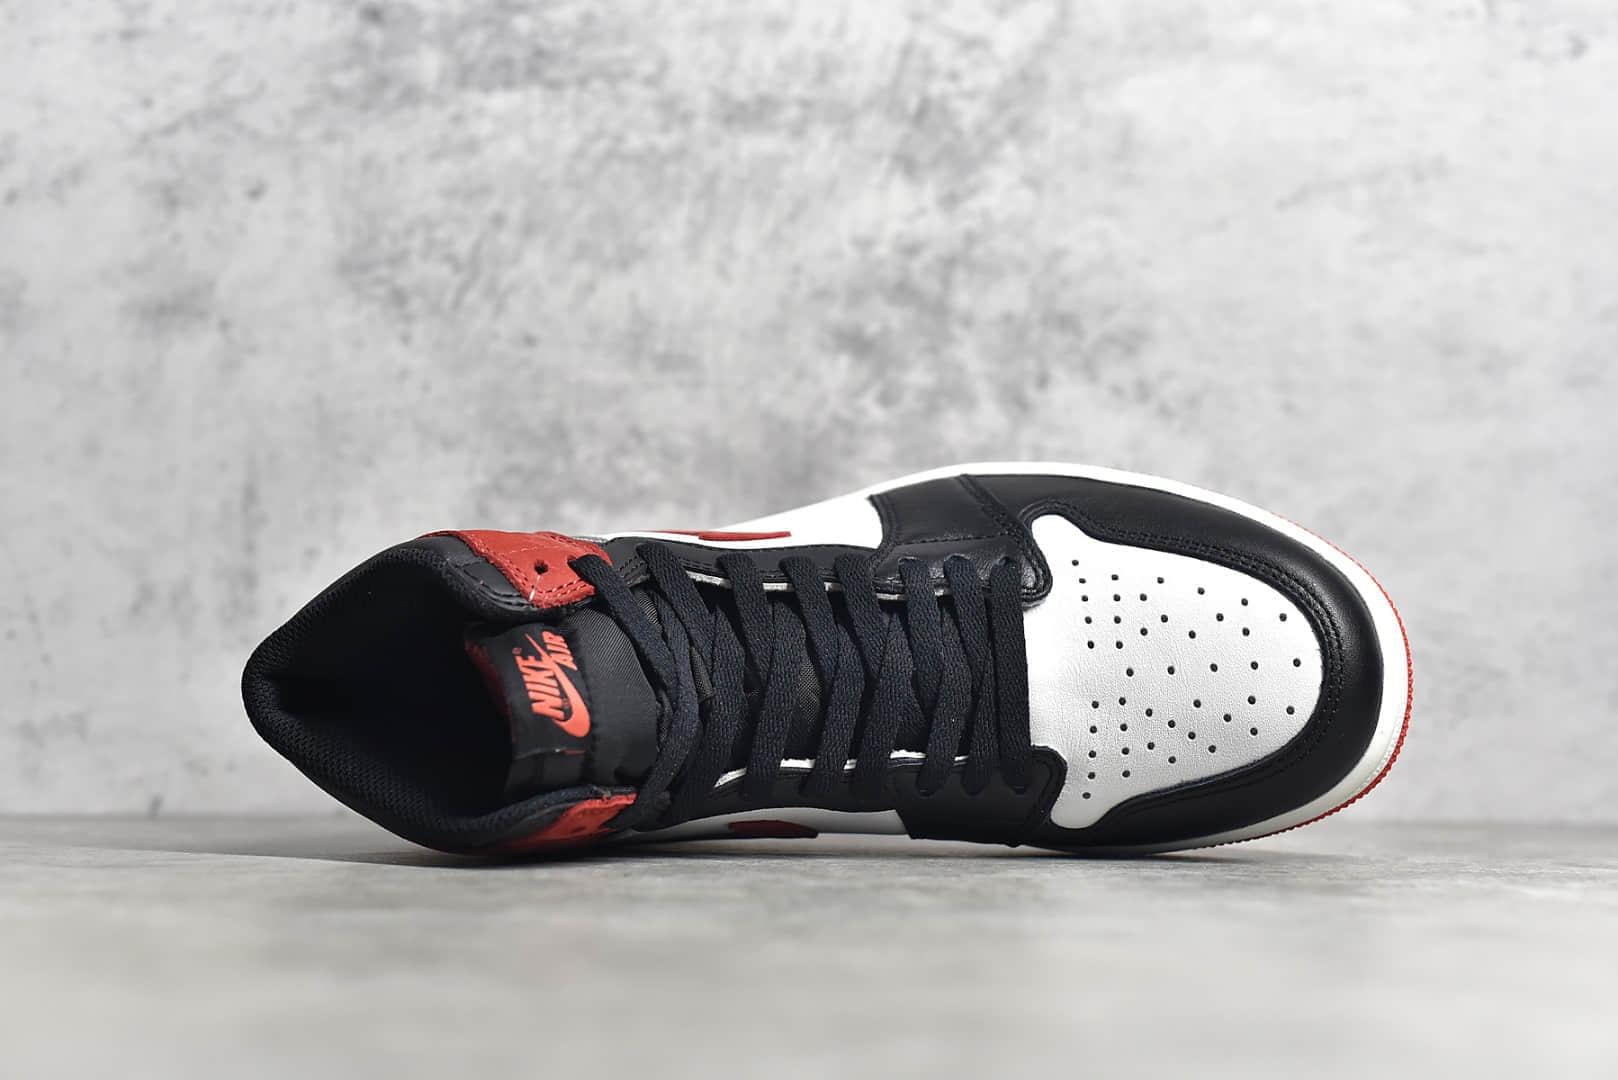 AJ1六冠王白红高帮 Air Jordan 1 Retro